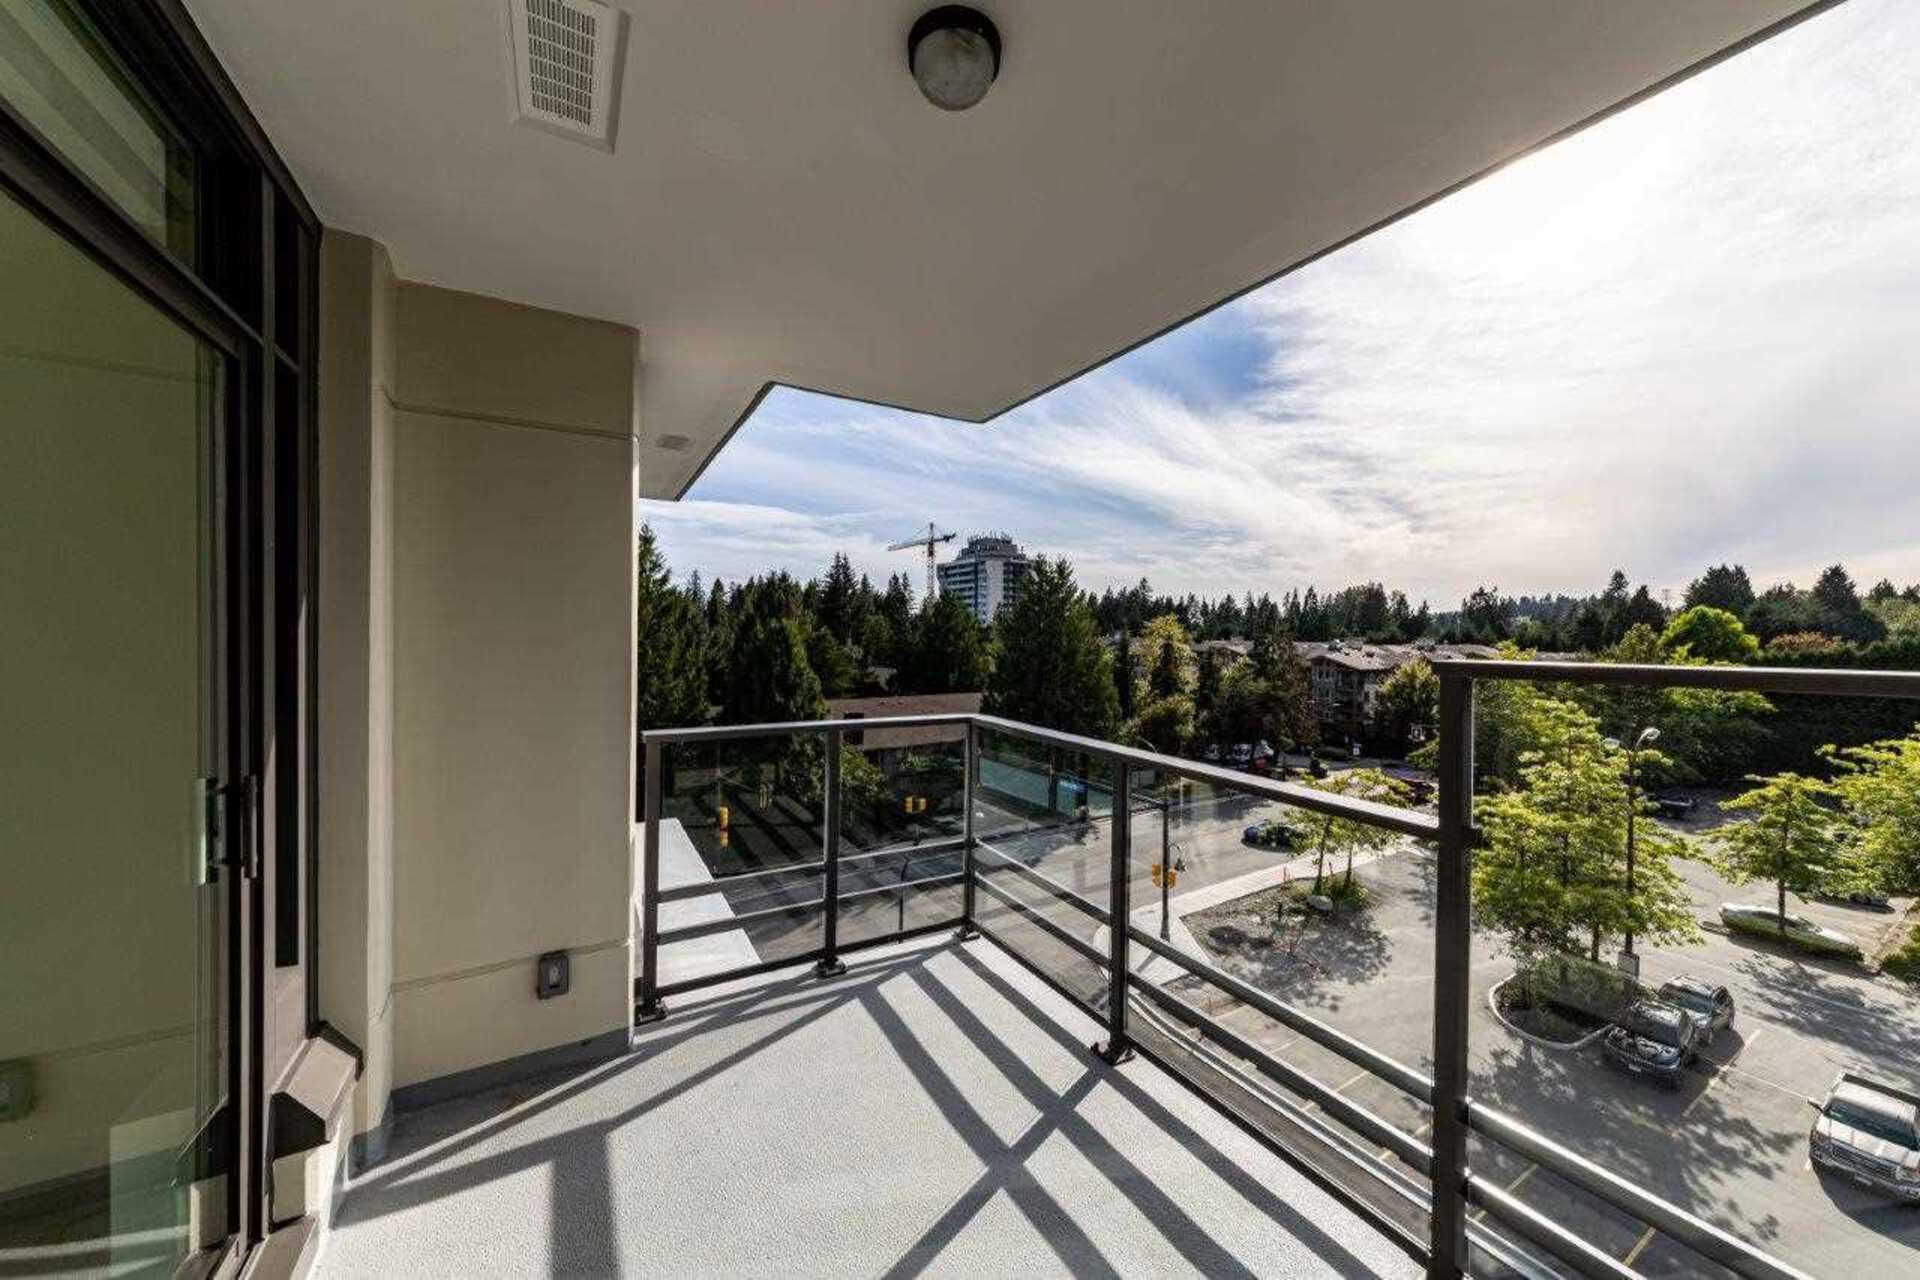 1210-e-27th-street-lynn-valley-north-vancouver-29 at 405 - 1210 E 27th Street, Lynn Valley, North Vancouver